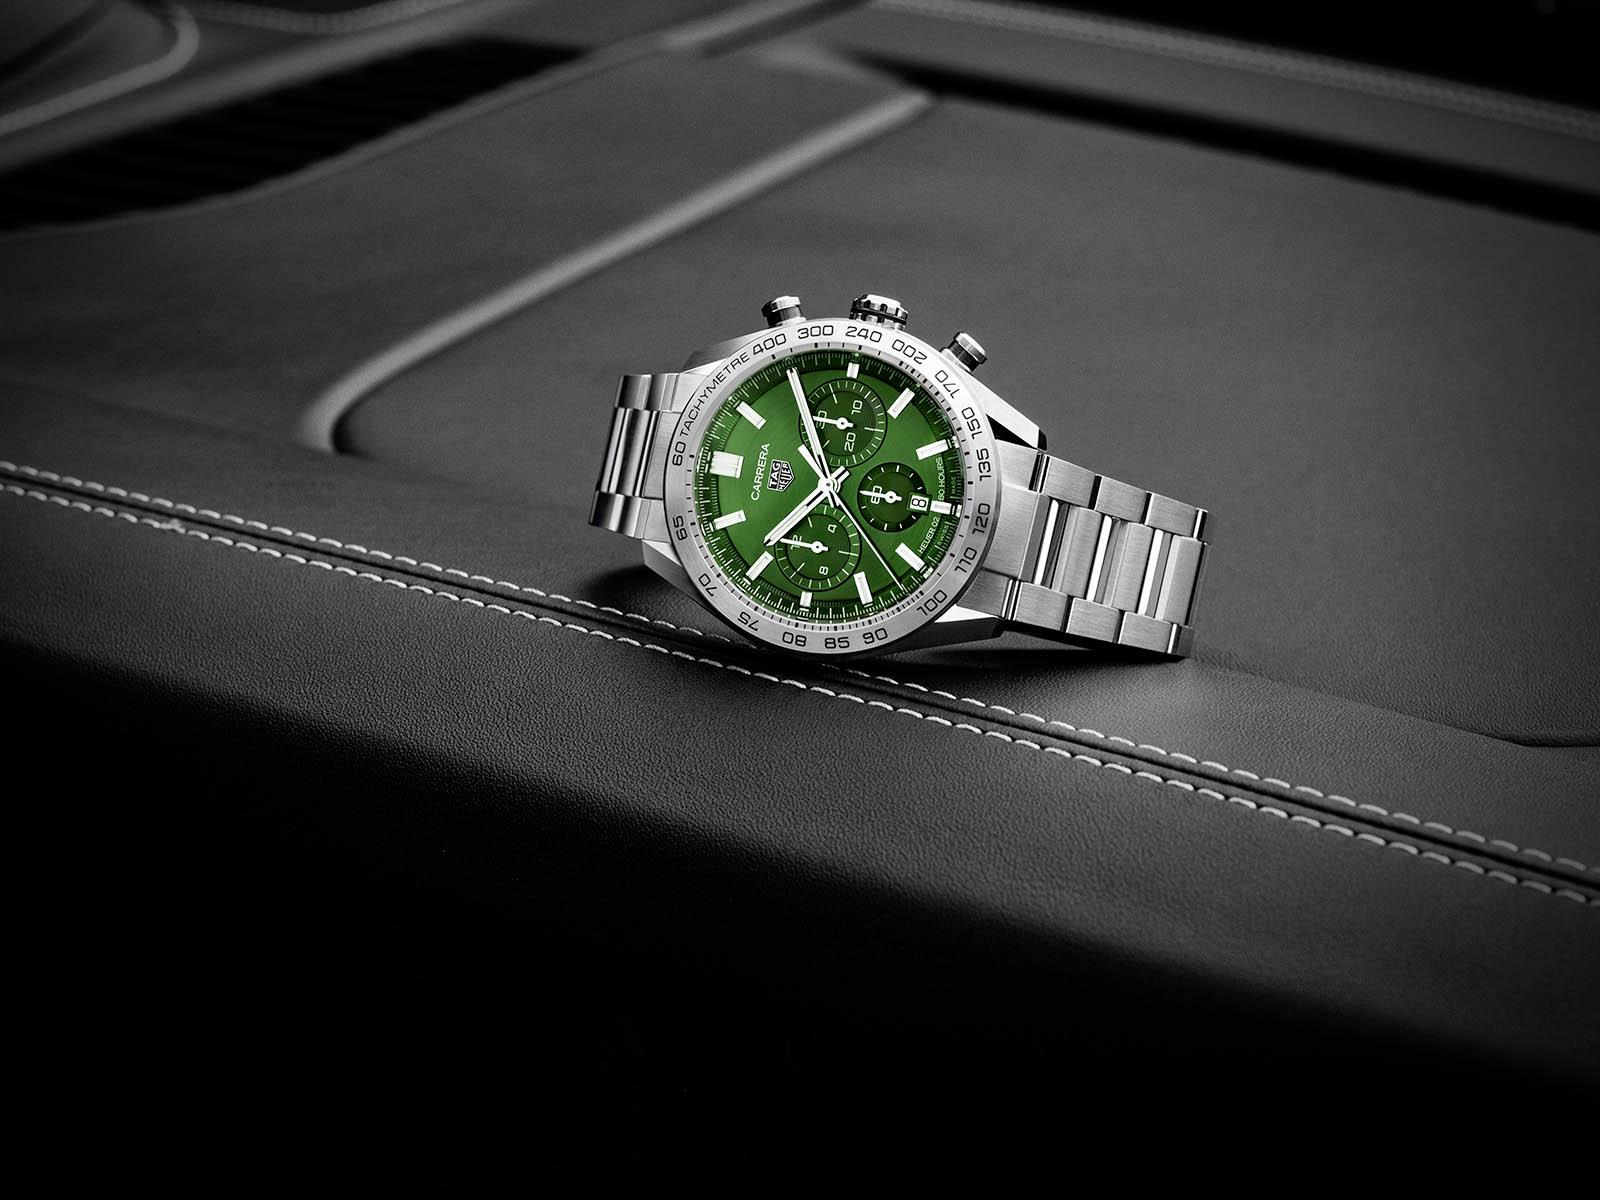 cbn2a10-ba0643-tag-heuer-carrera-sport-chronograph-44mm-calibre-heuer-02-automatic-3.jpg